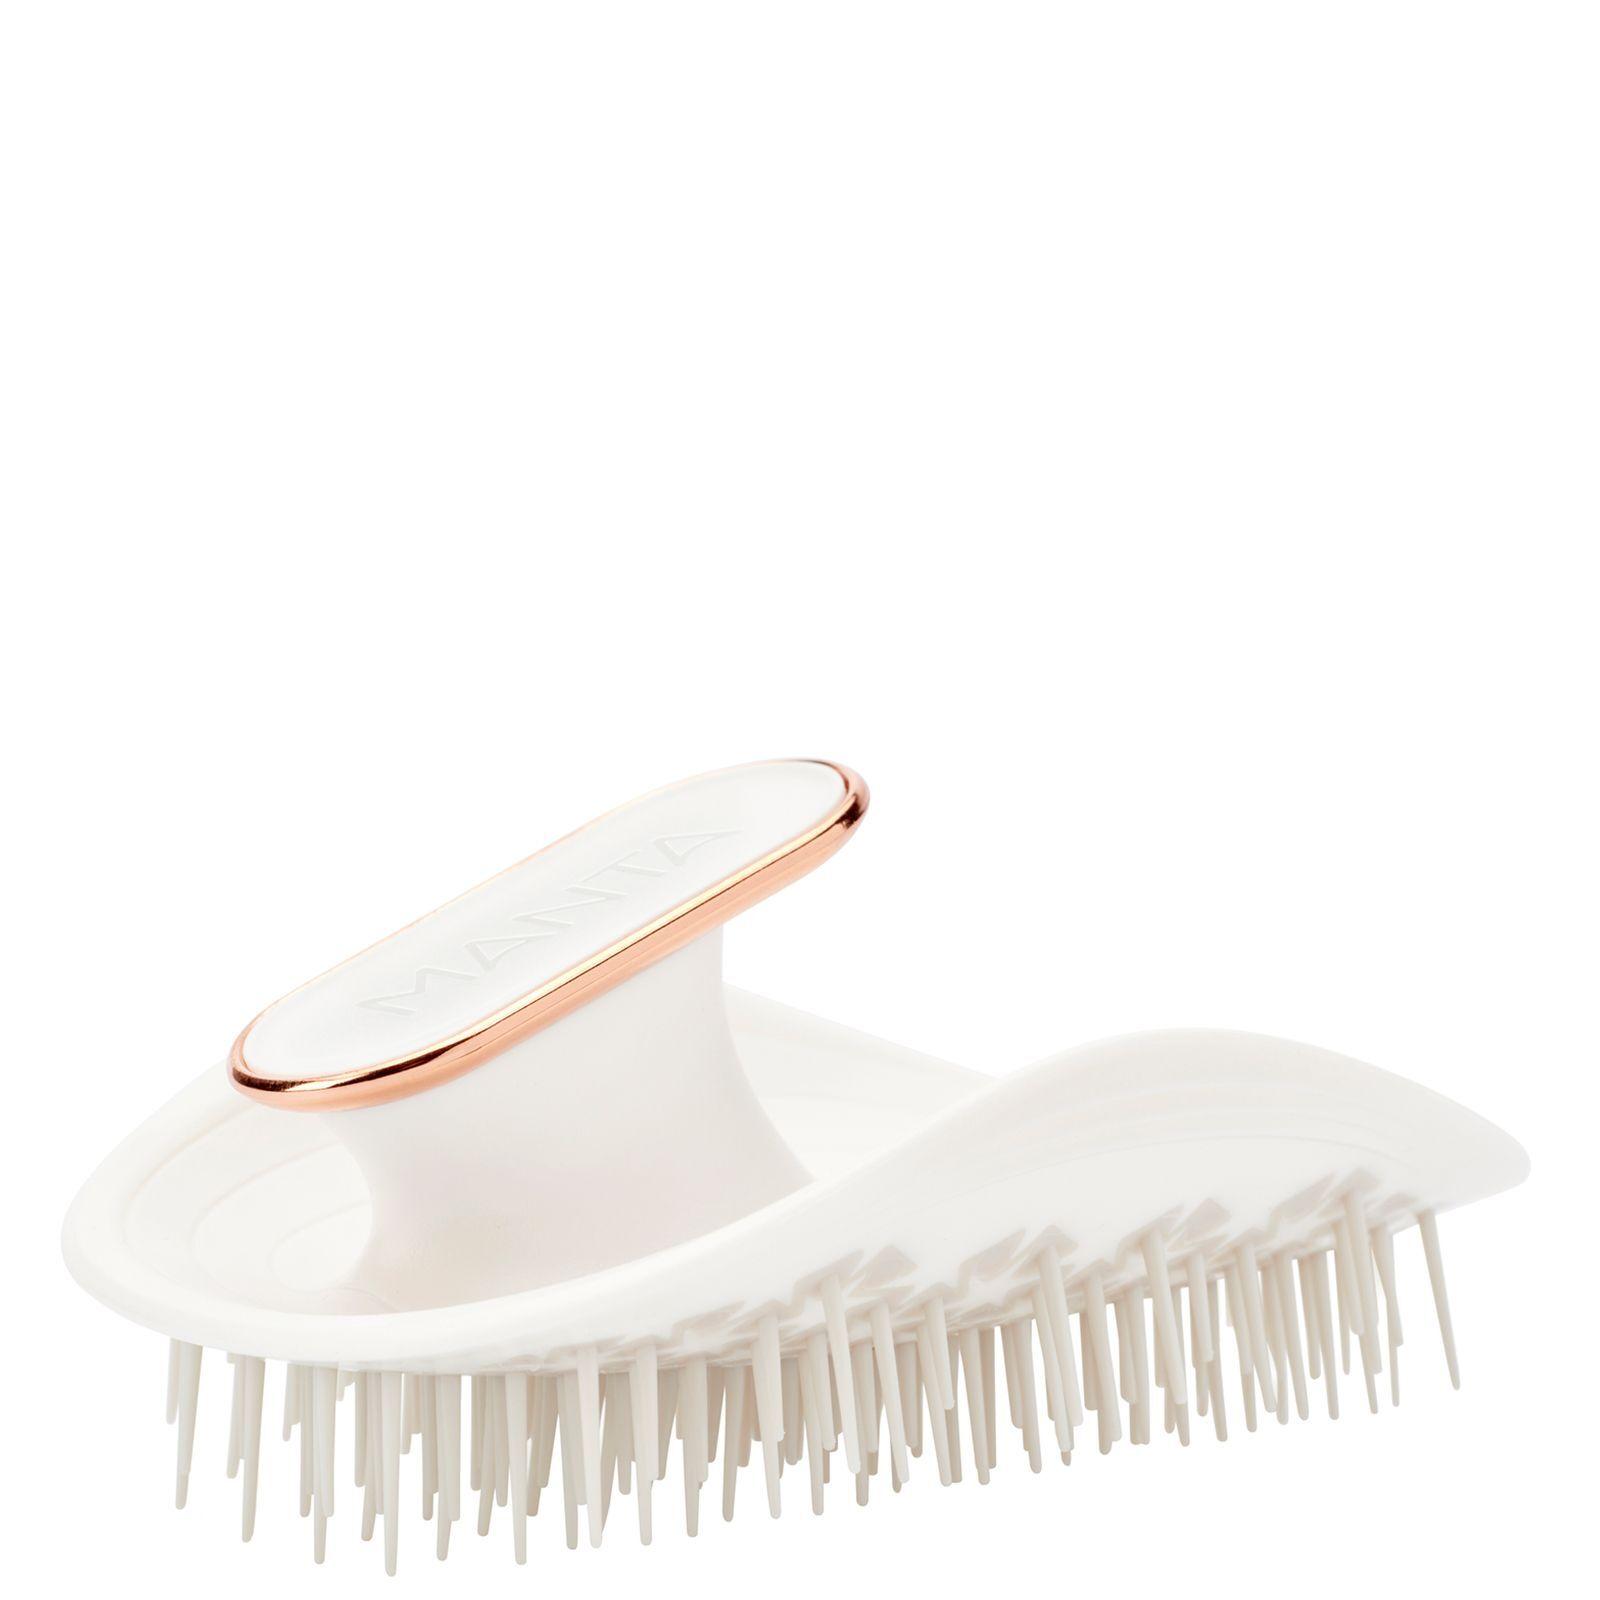 Manta - Original White Hairbrush for Women